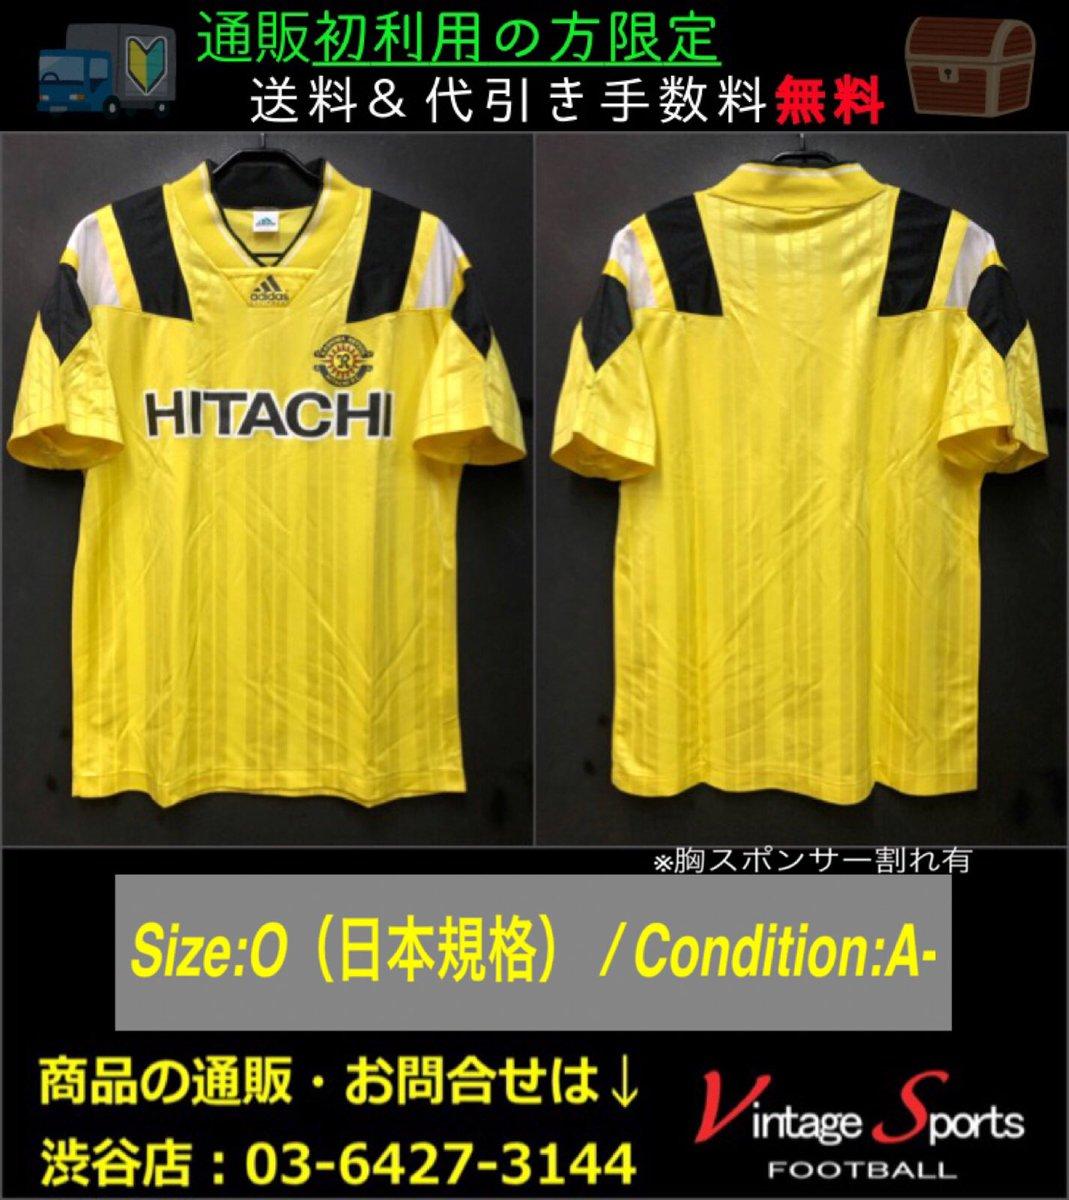 "Vintage Sports Twitterren: ""【商品情報】渋谷店 / 03-6427-3144 ..."